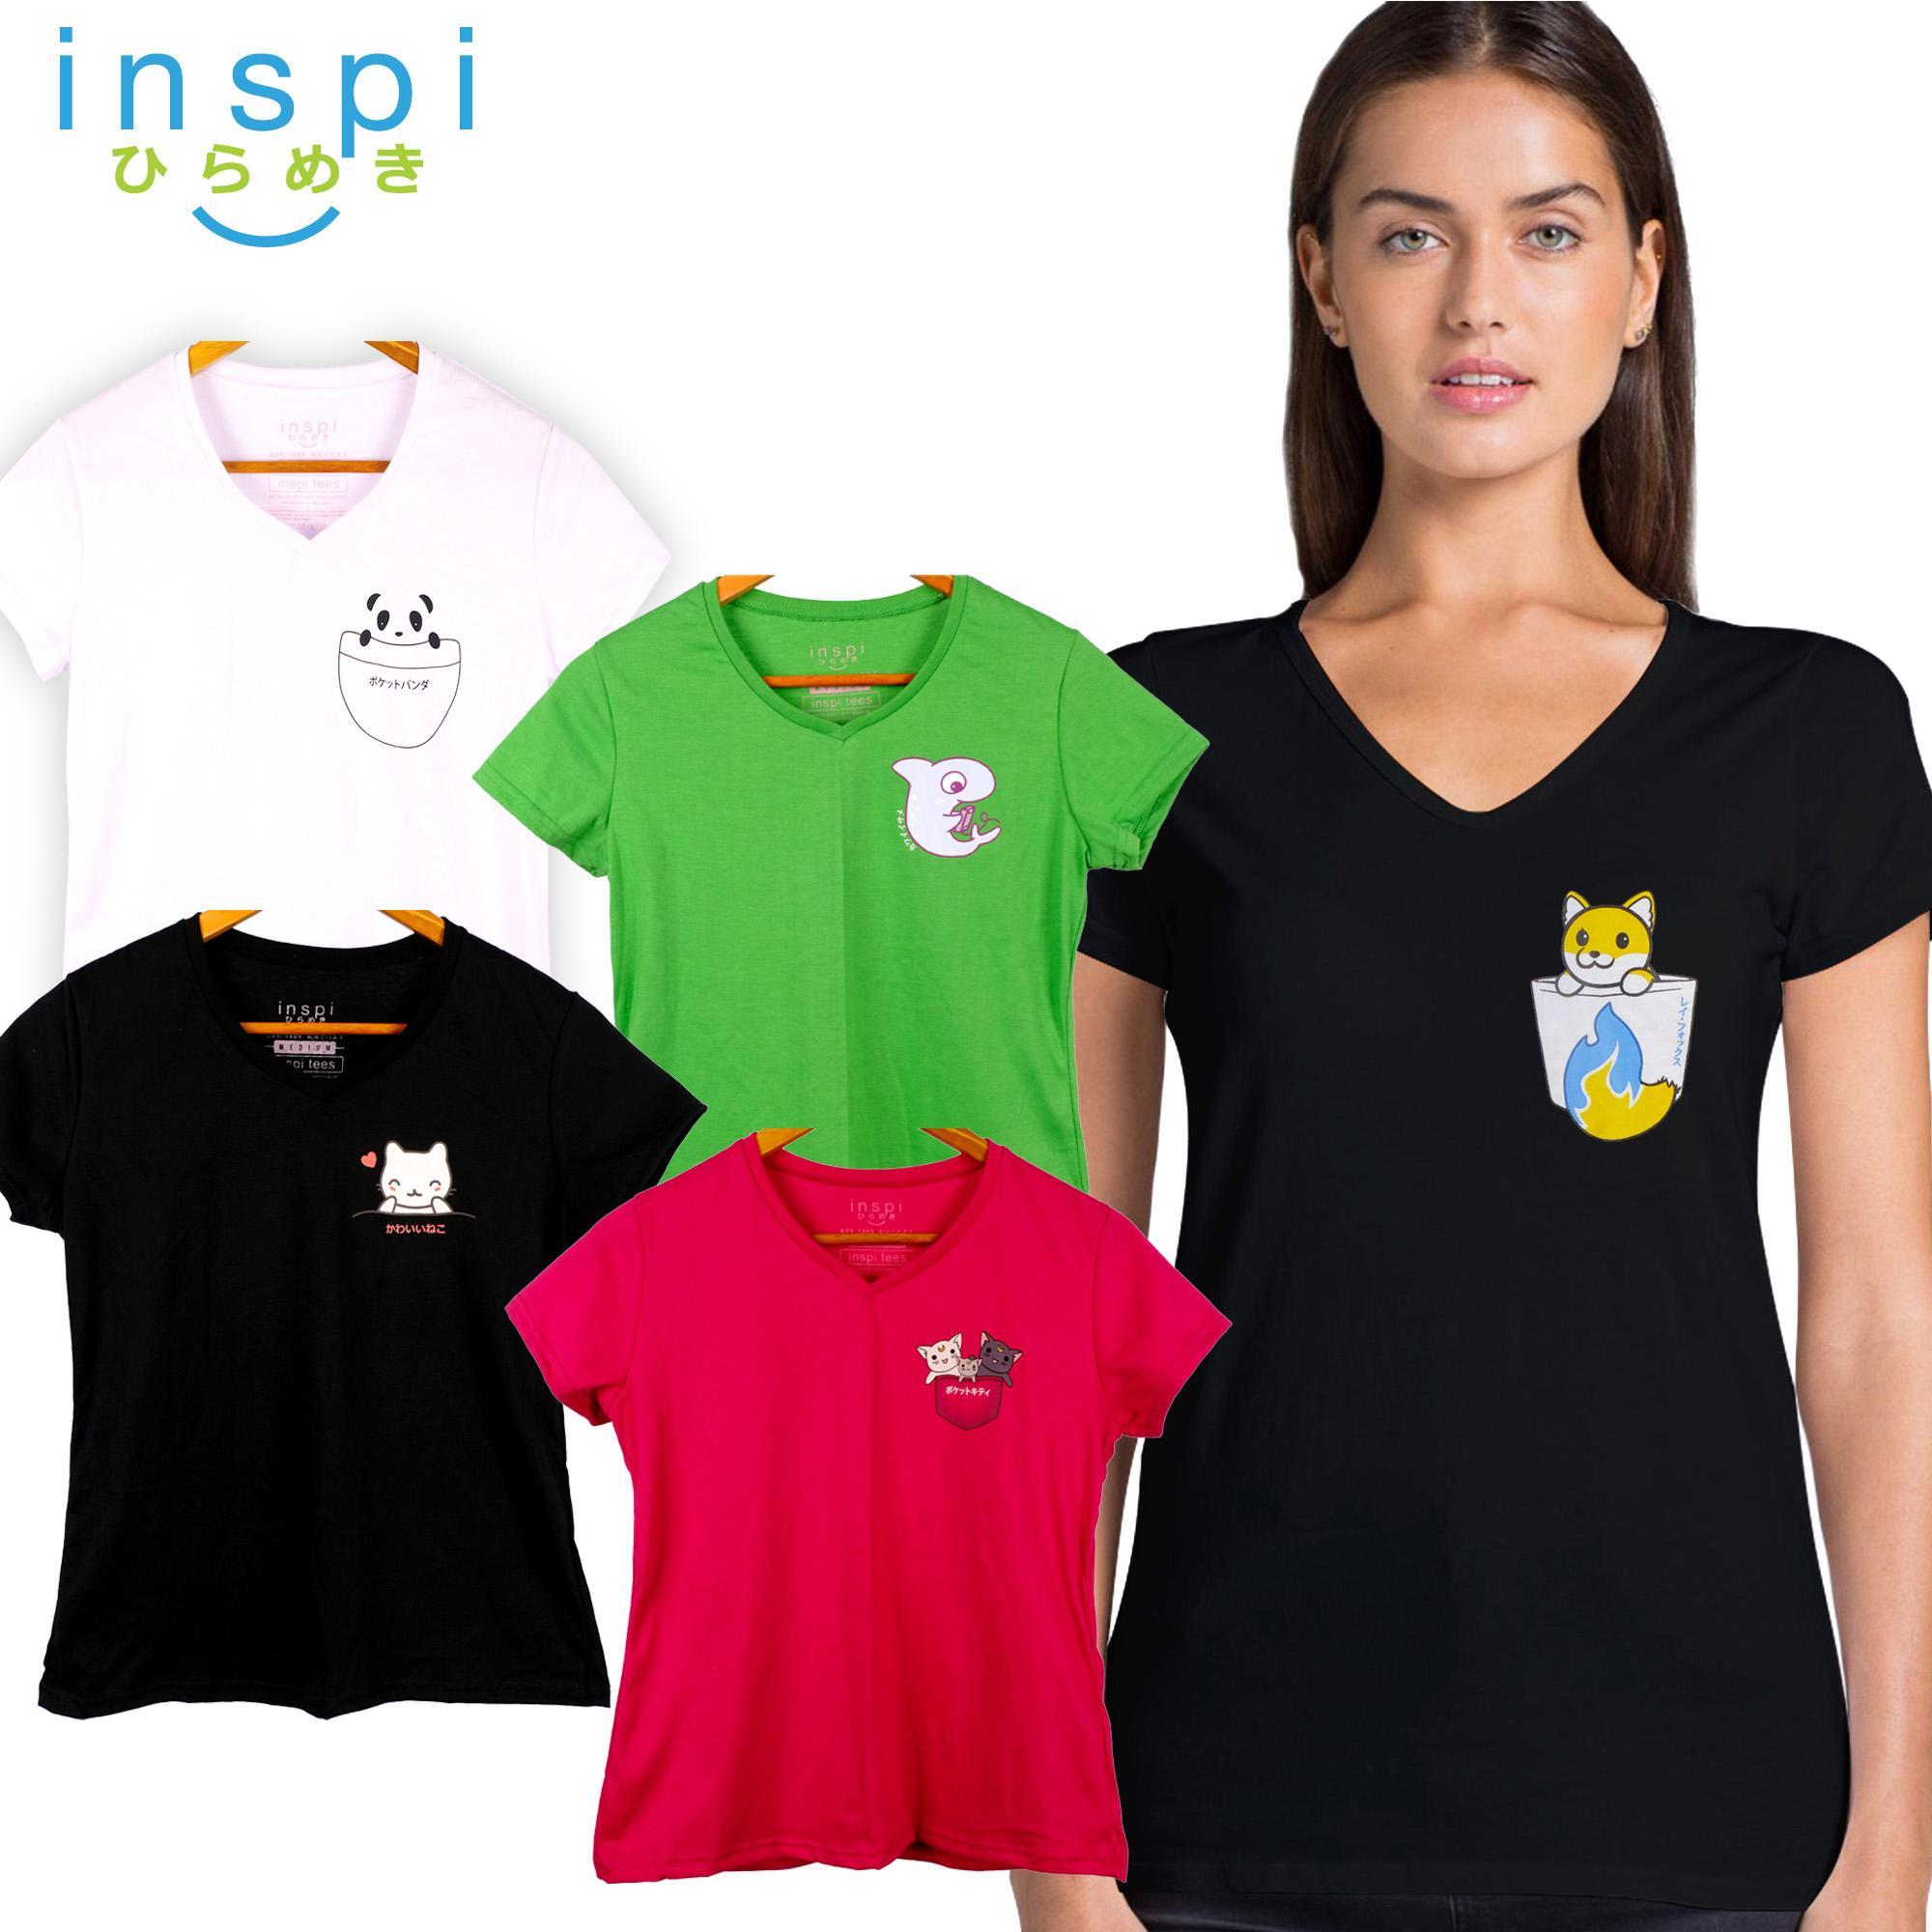 c5f5671c40d Womens Clothes for sale - Clothes for Women online brands